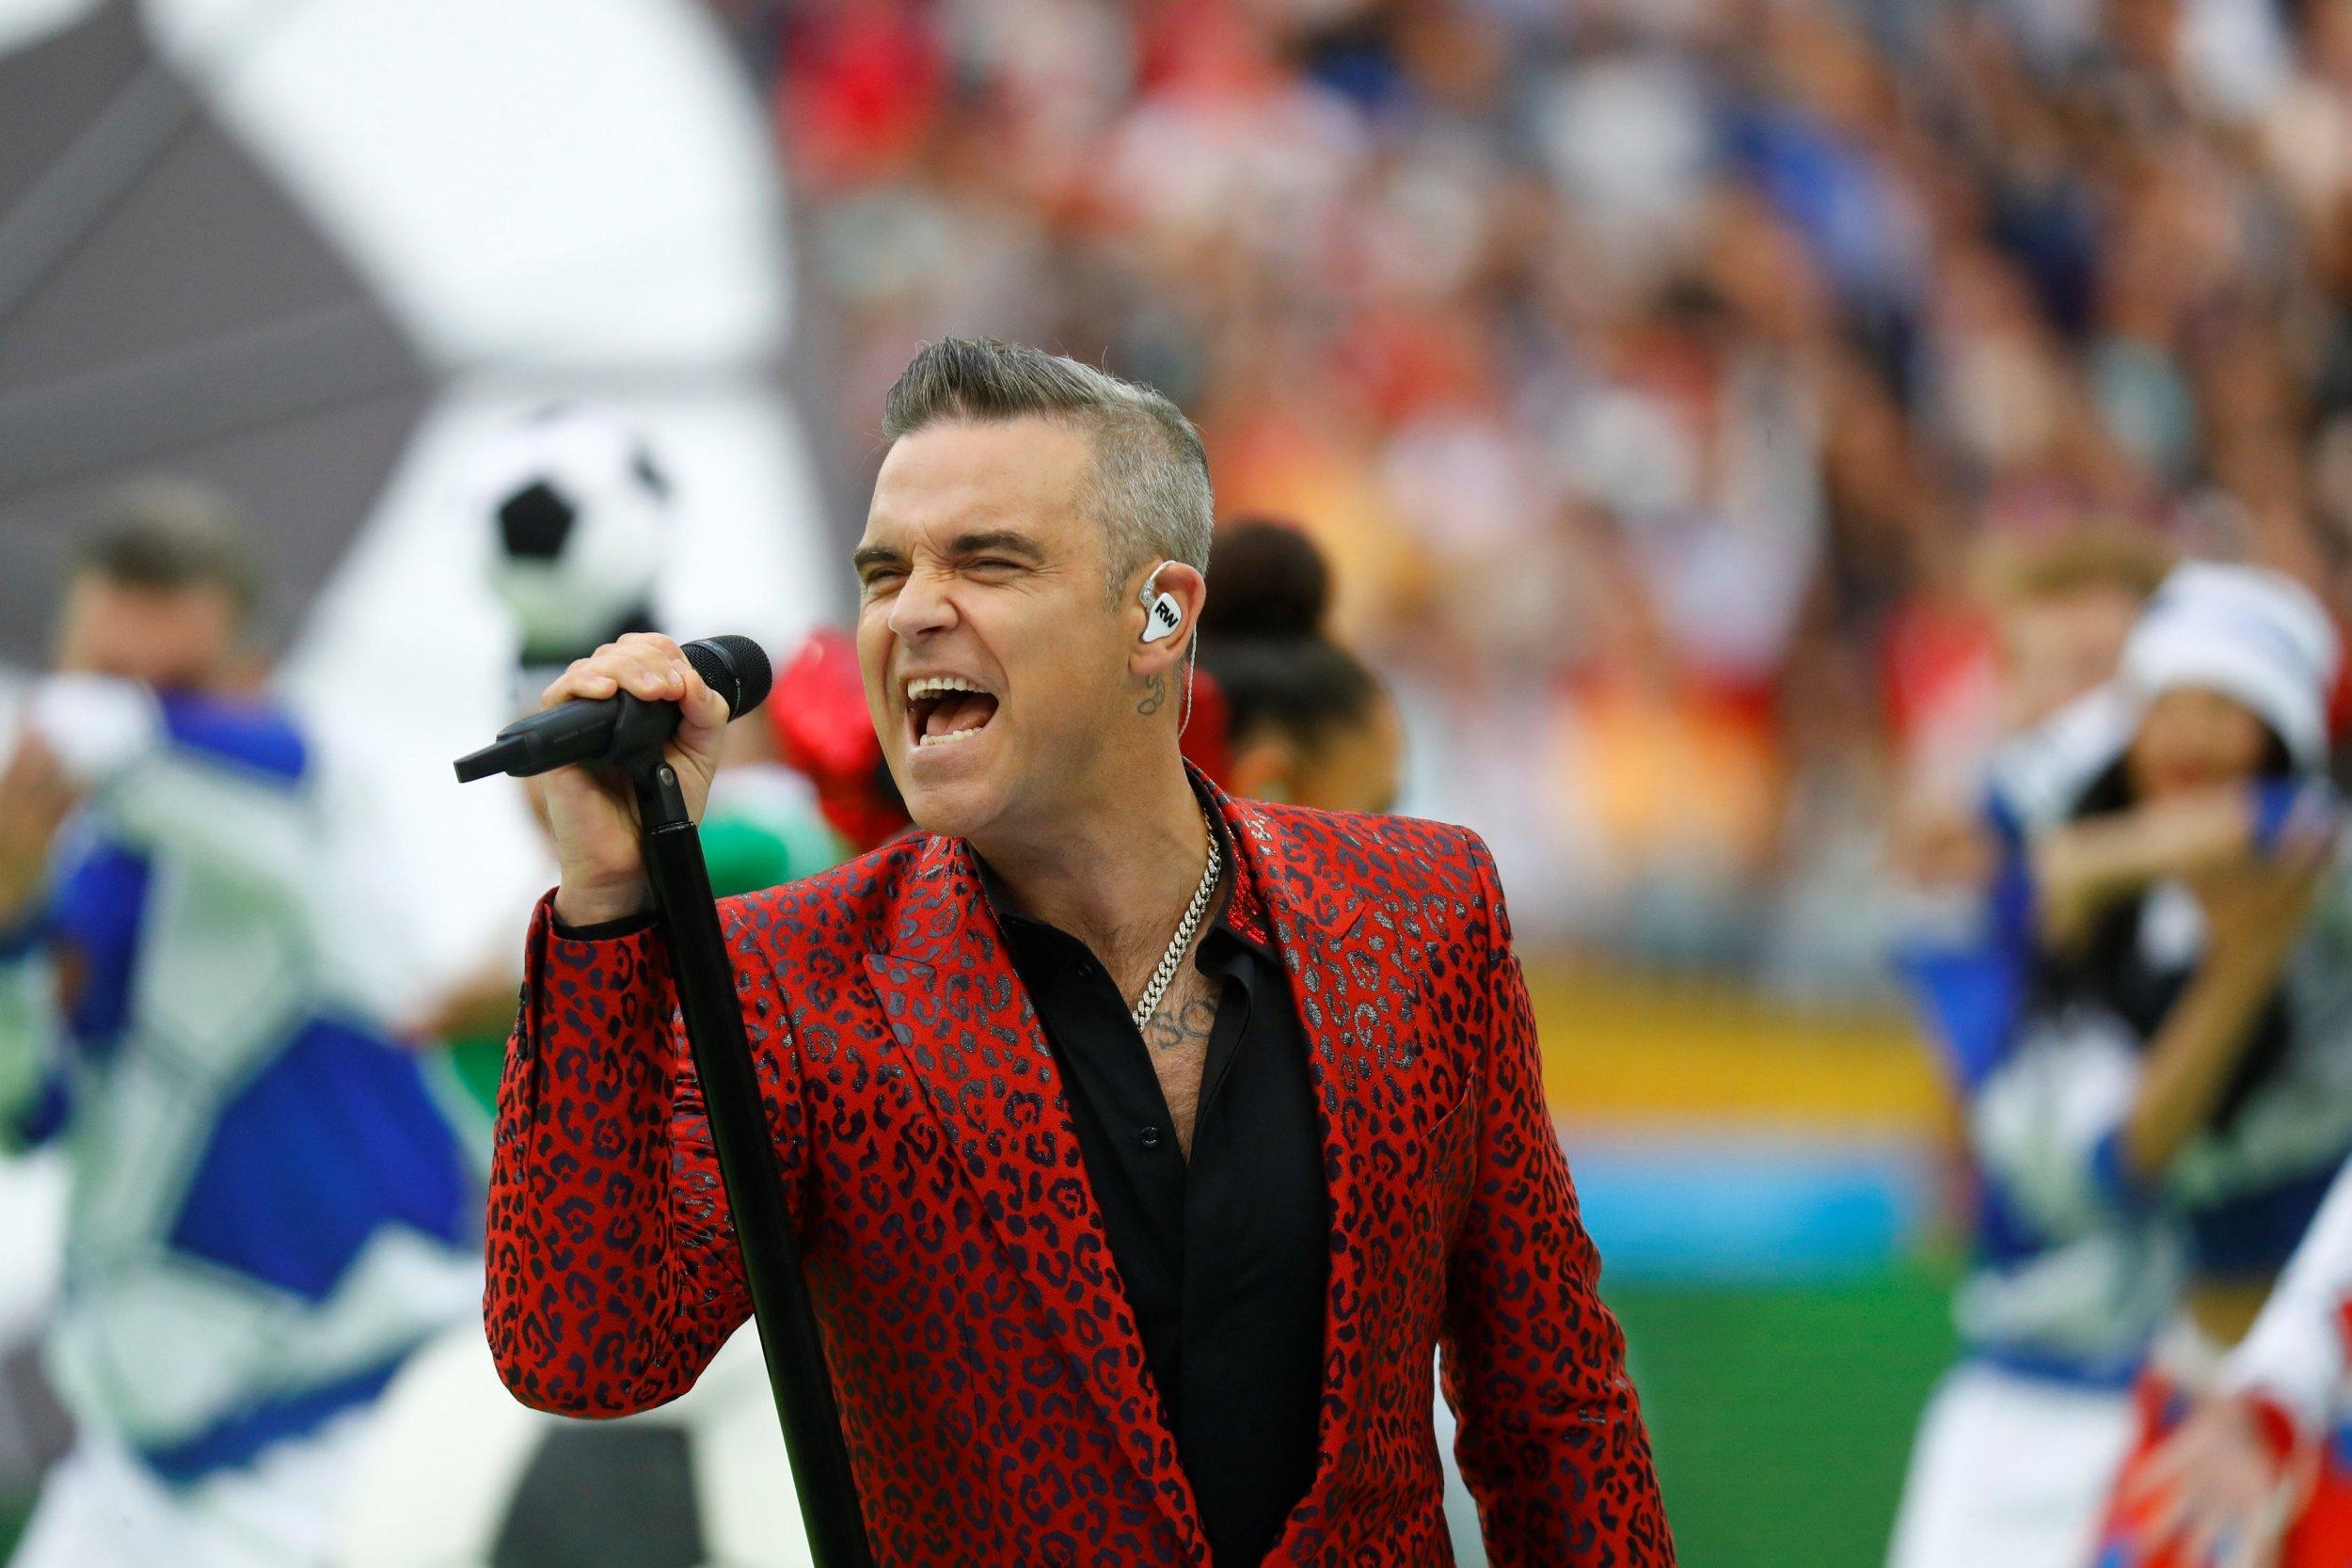 Robbie Williams en Rusia 2018 - 2500x1667